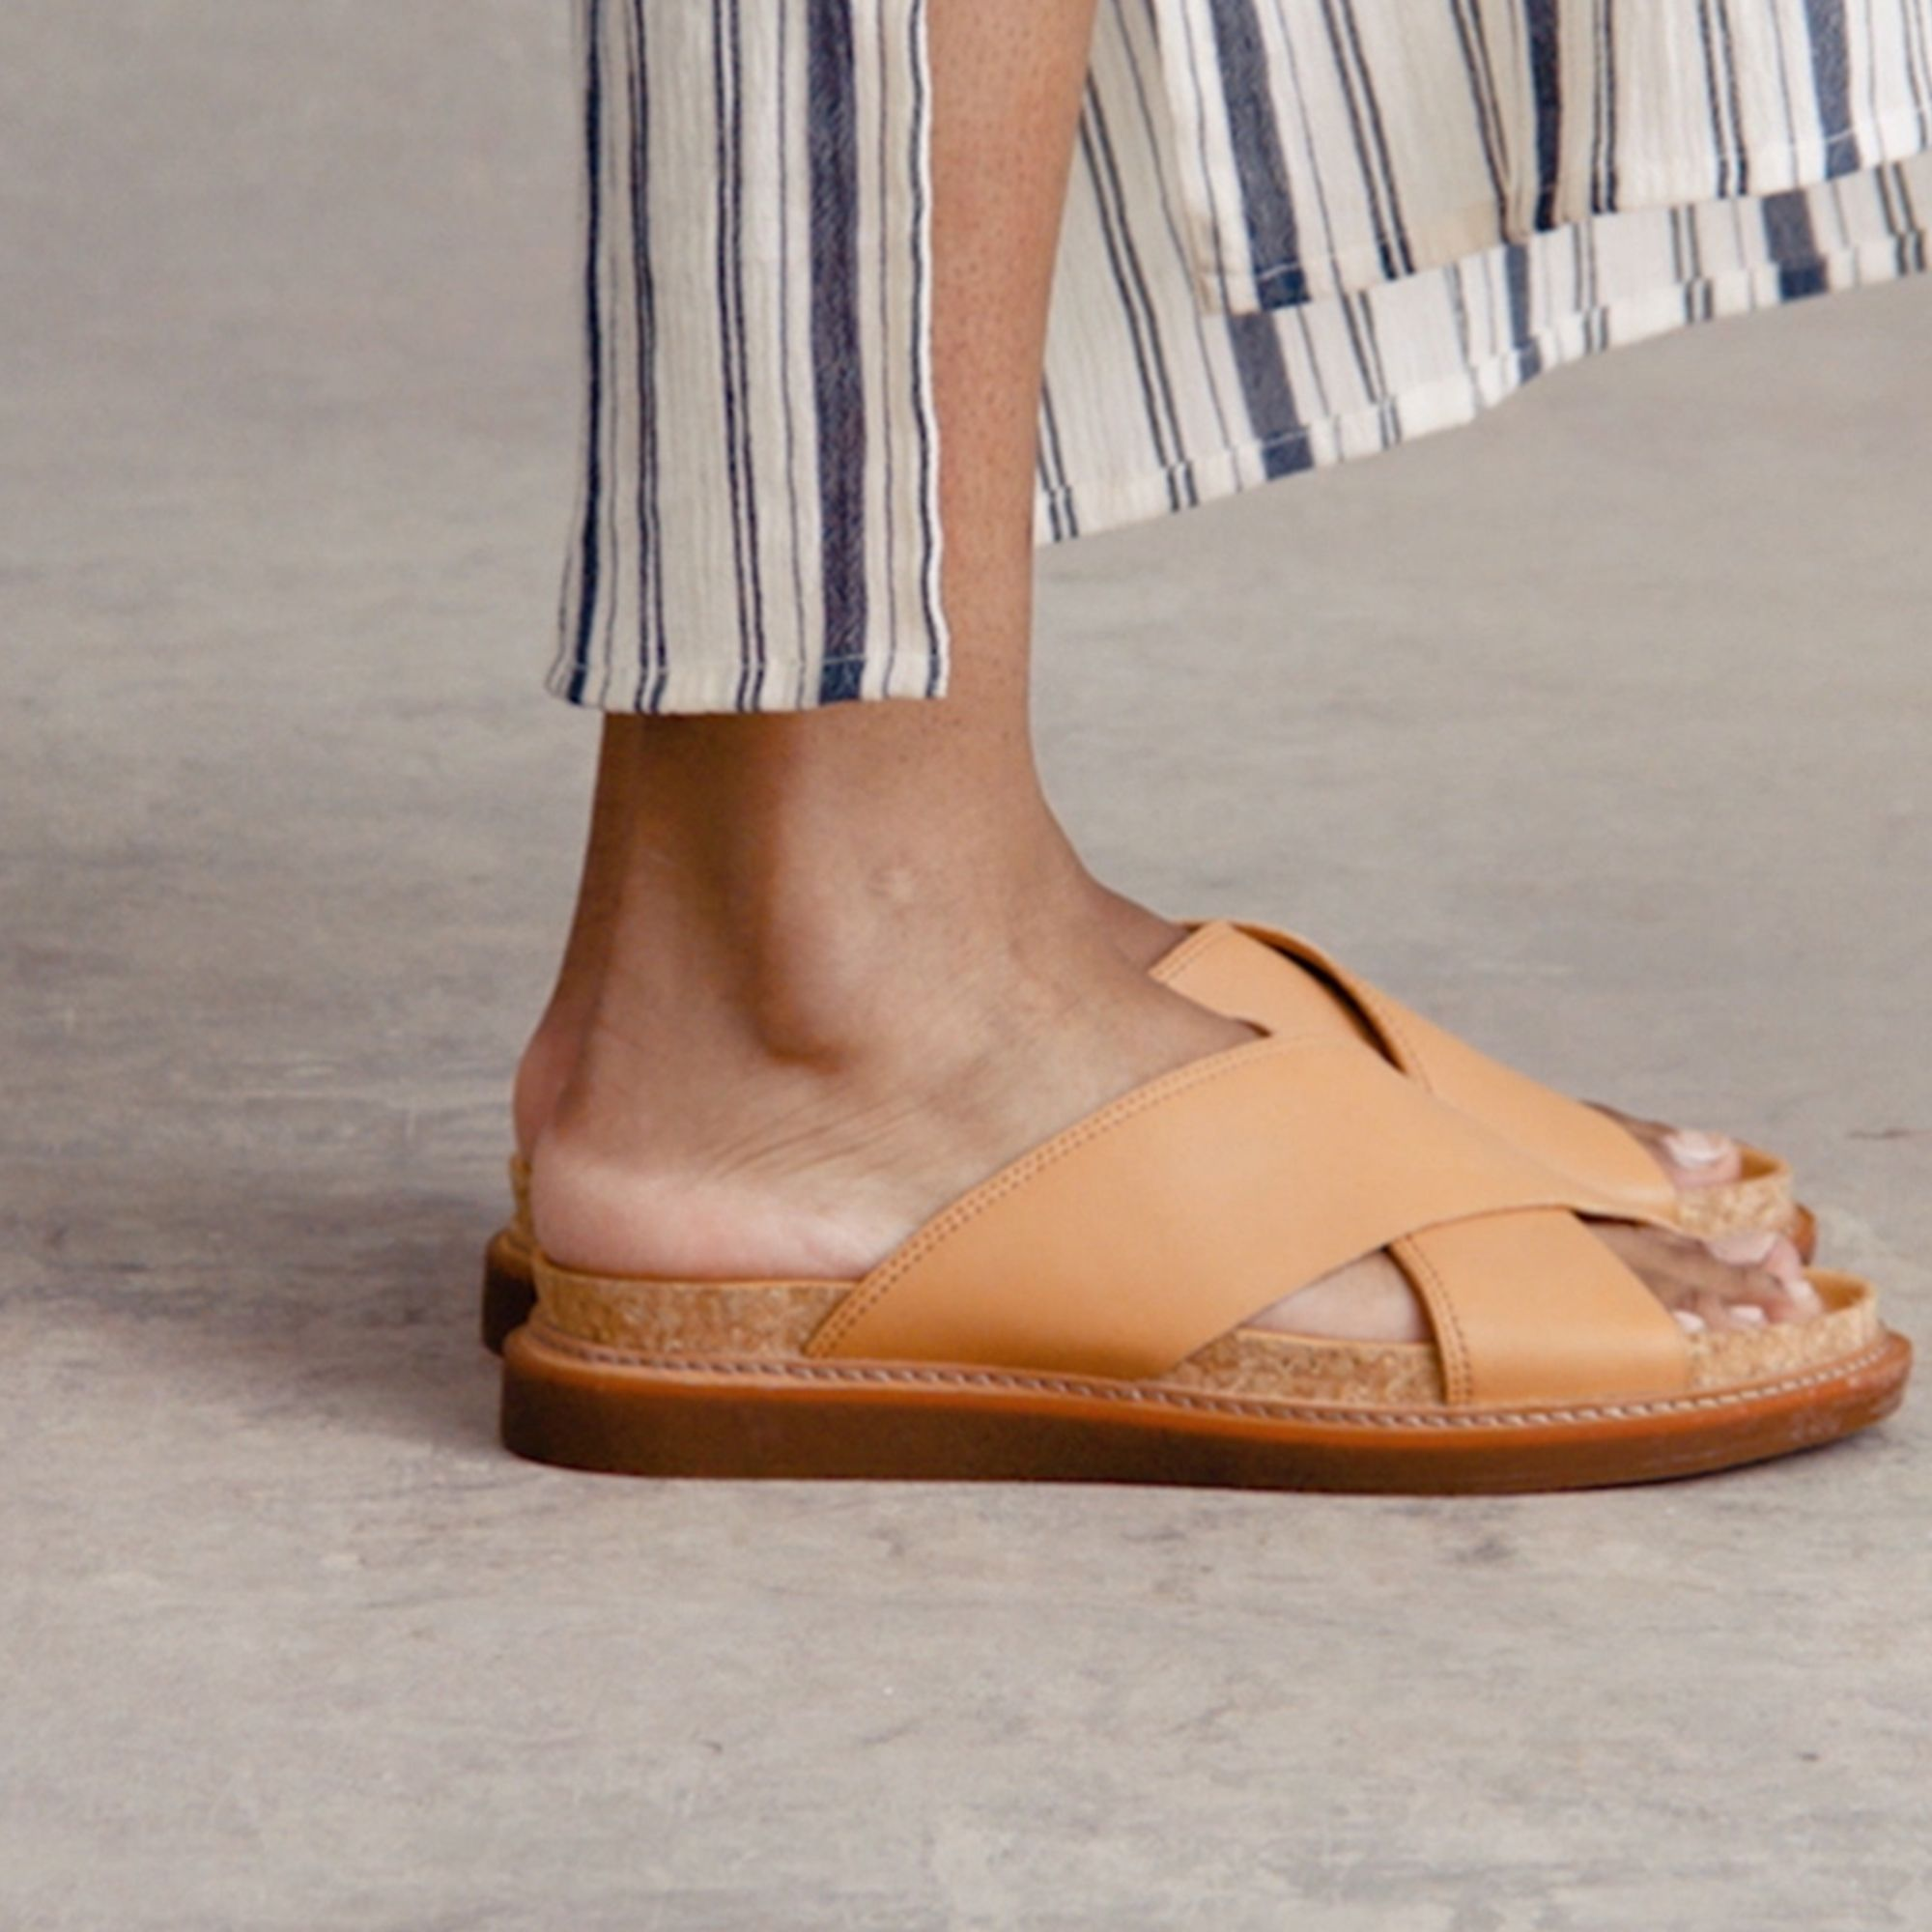 Clarks Trace Drift in Light Tan Leather